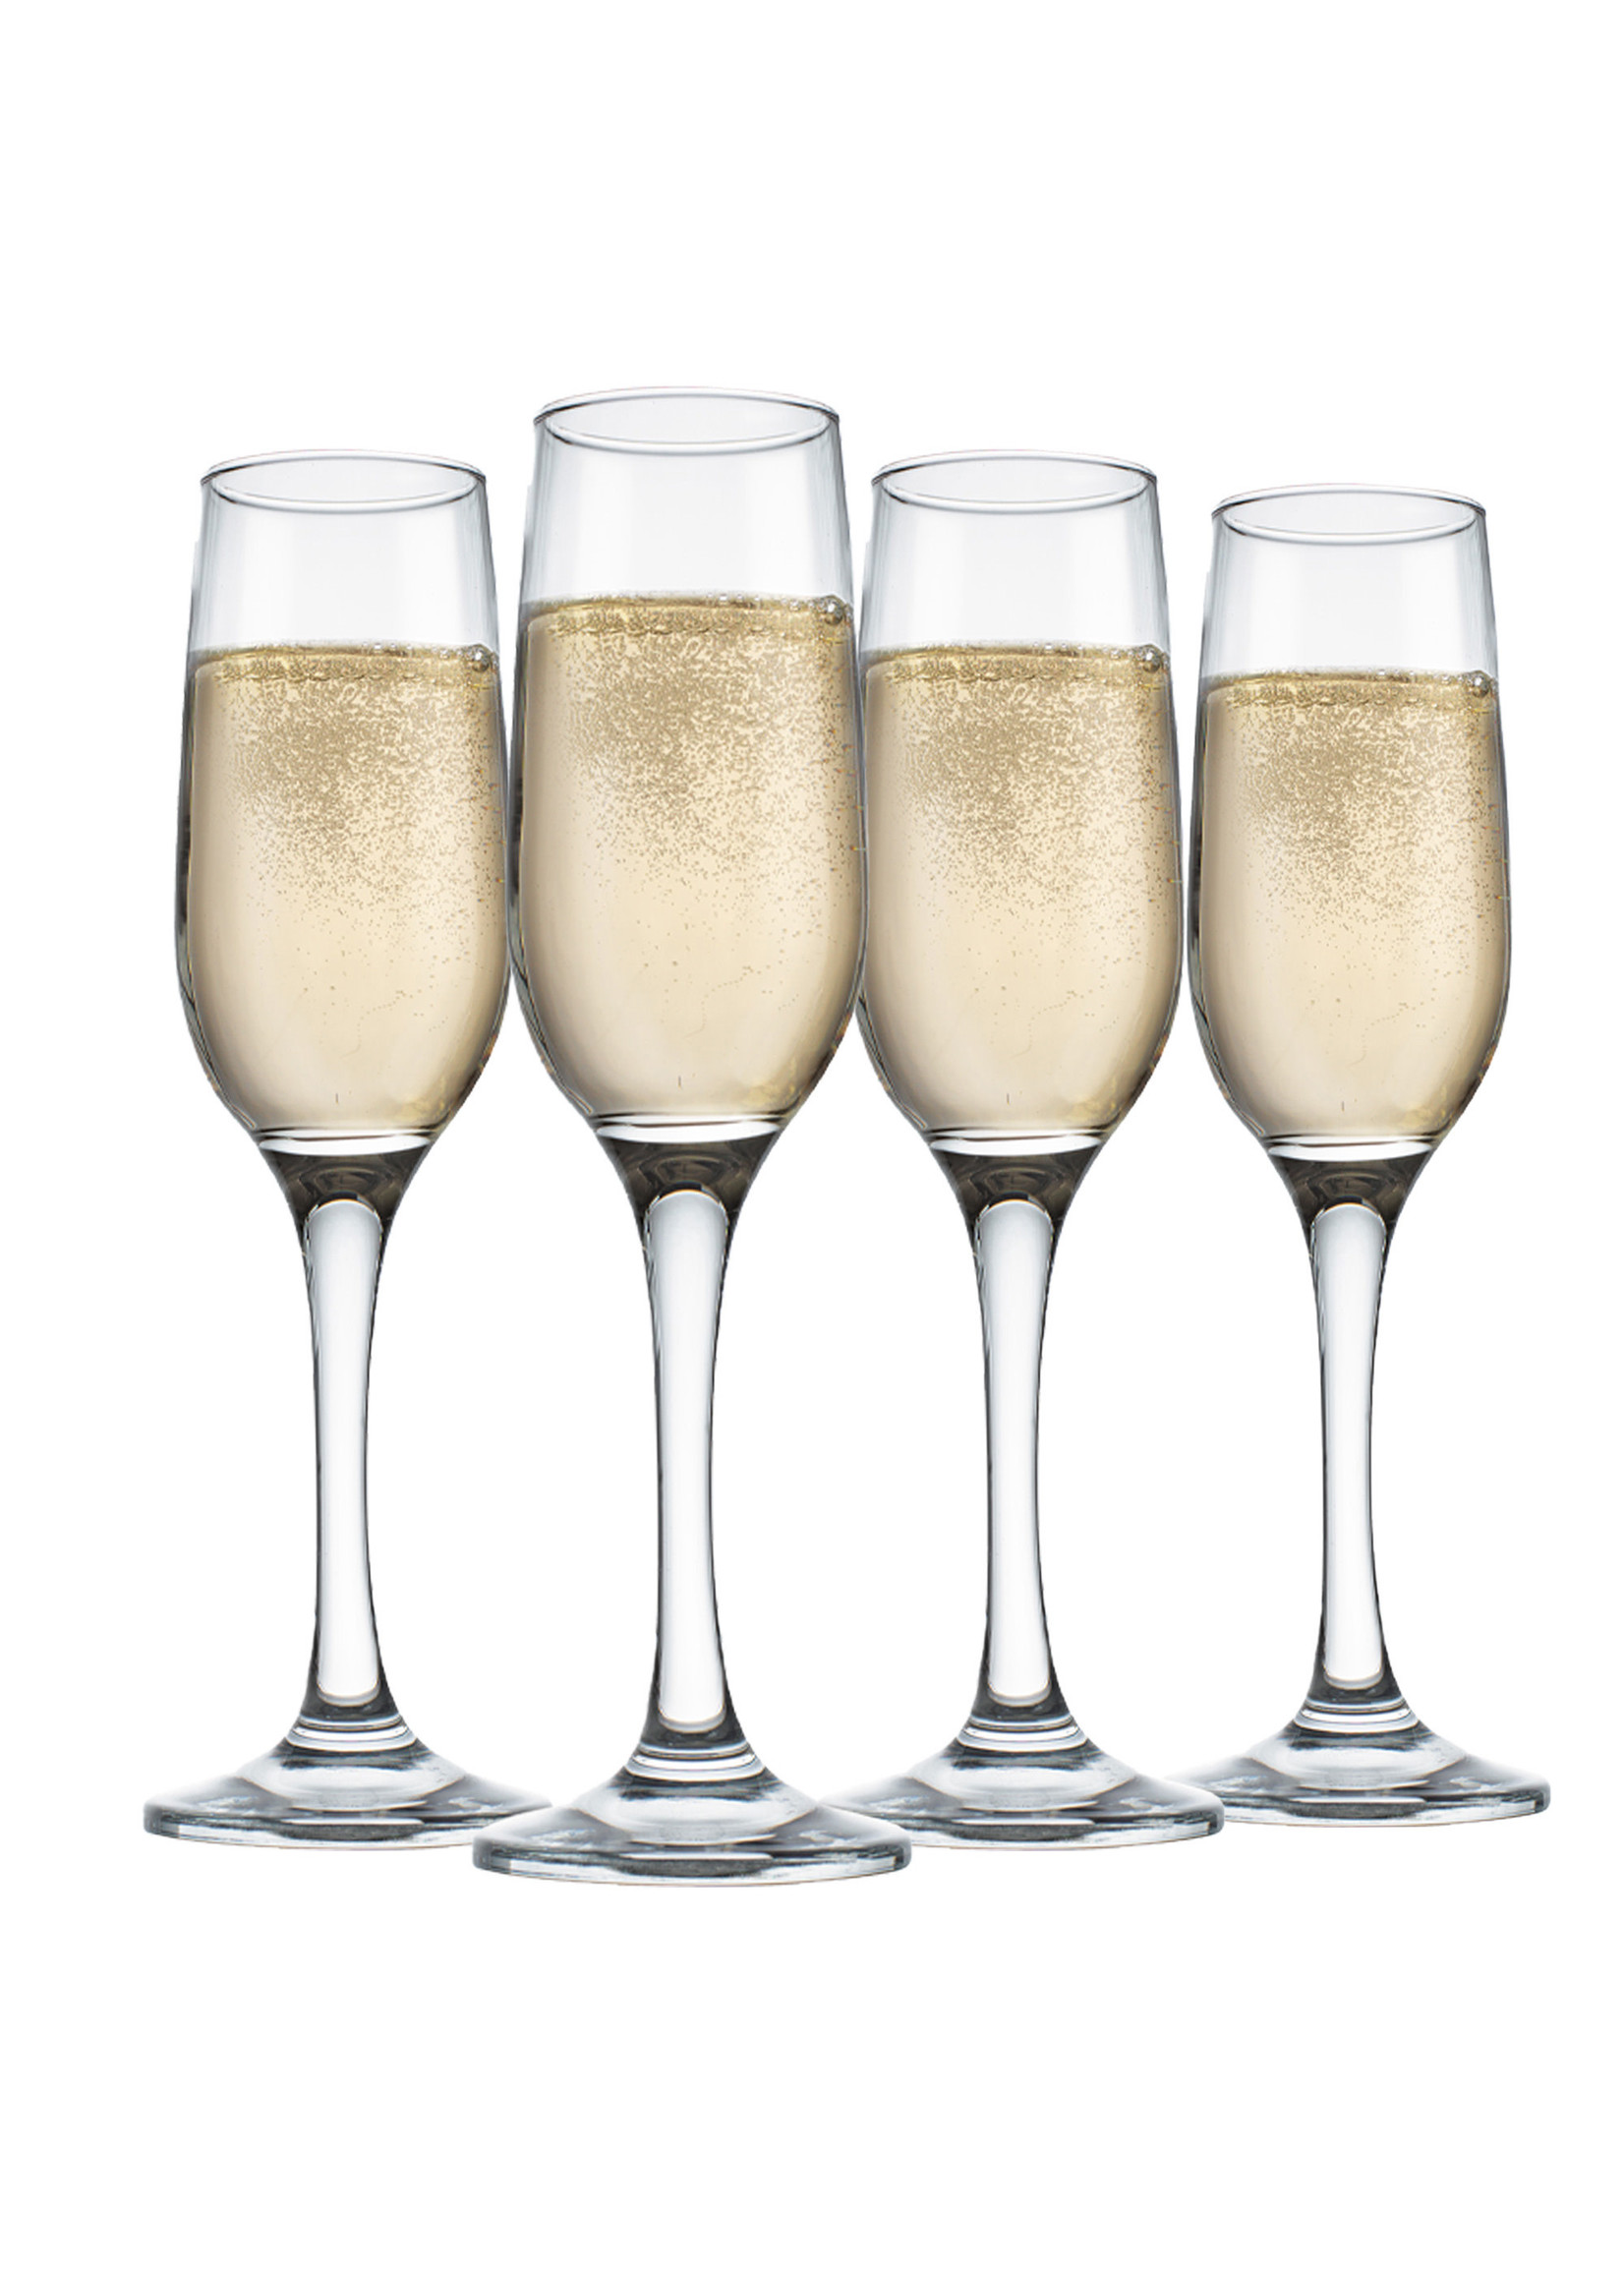 Home Essentials 7.25 oz Champagne Flutes - Set of 4